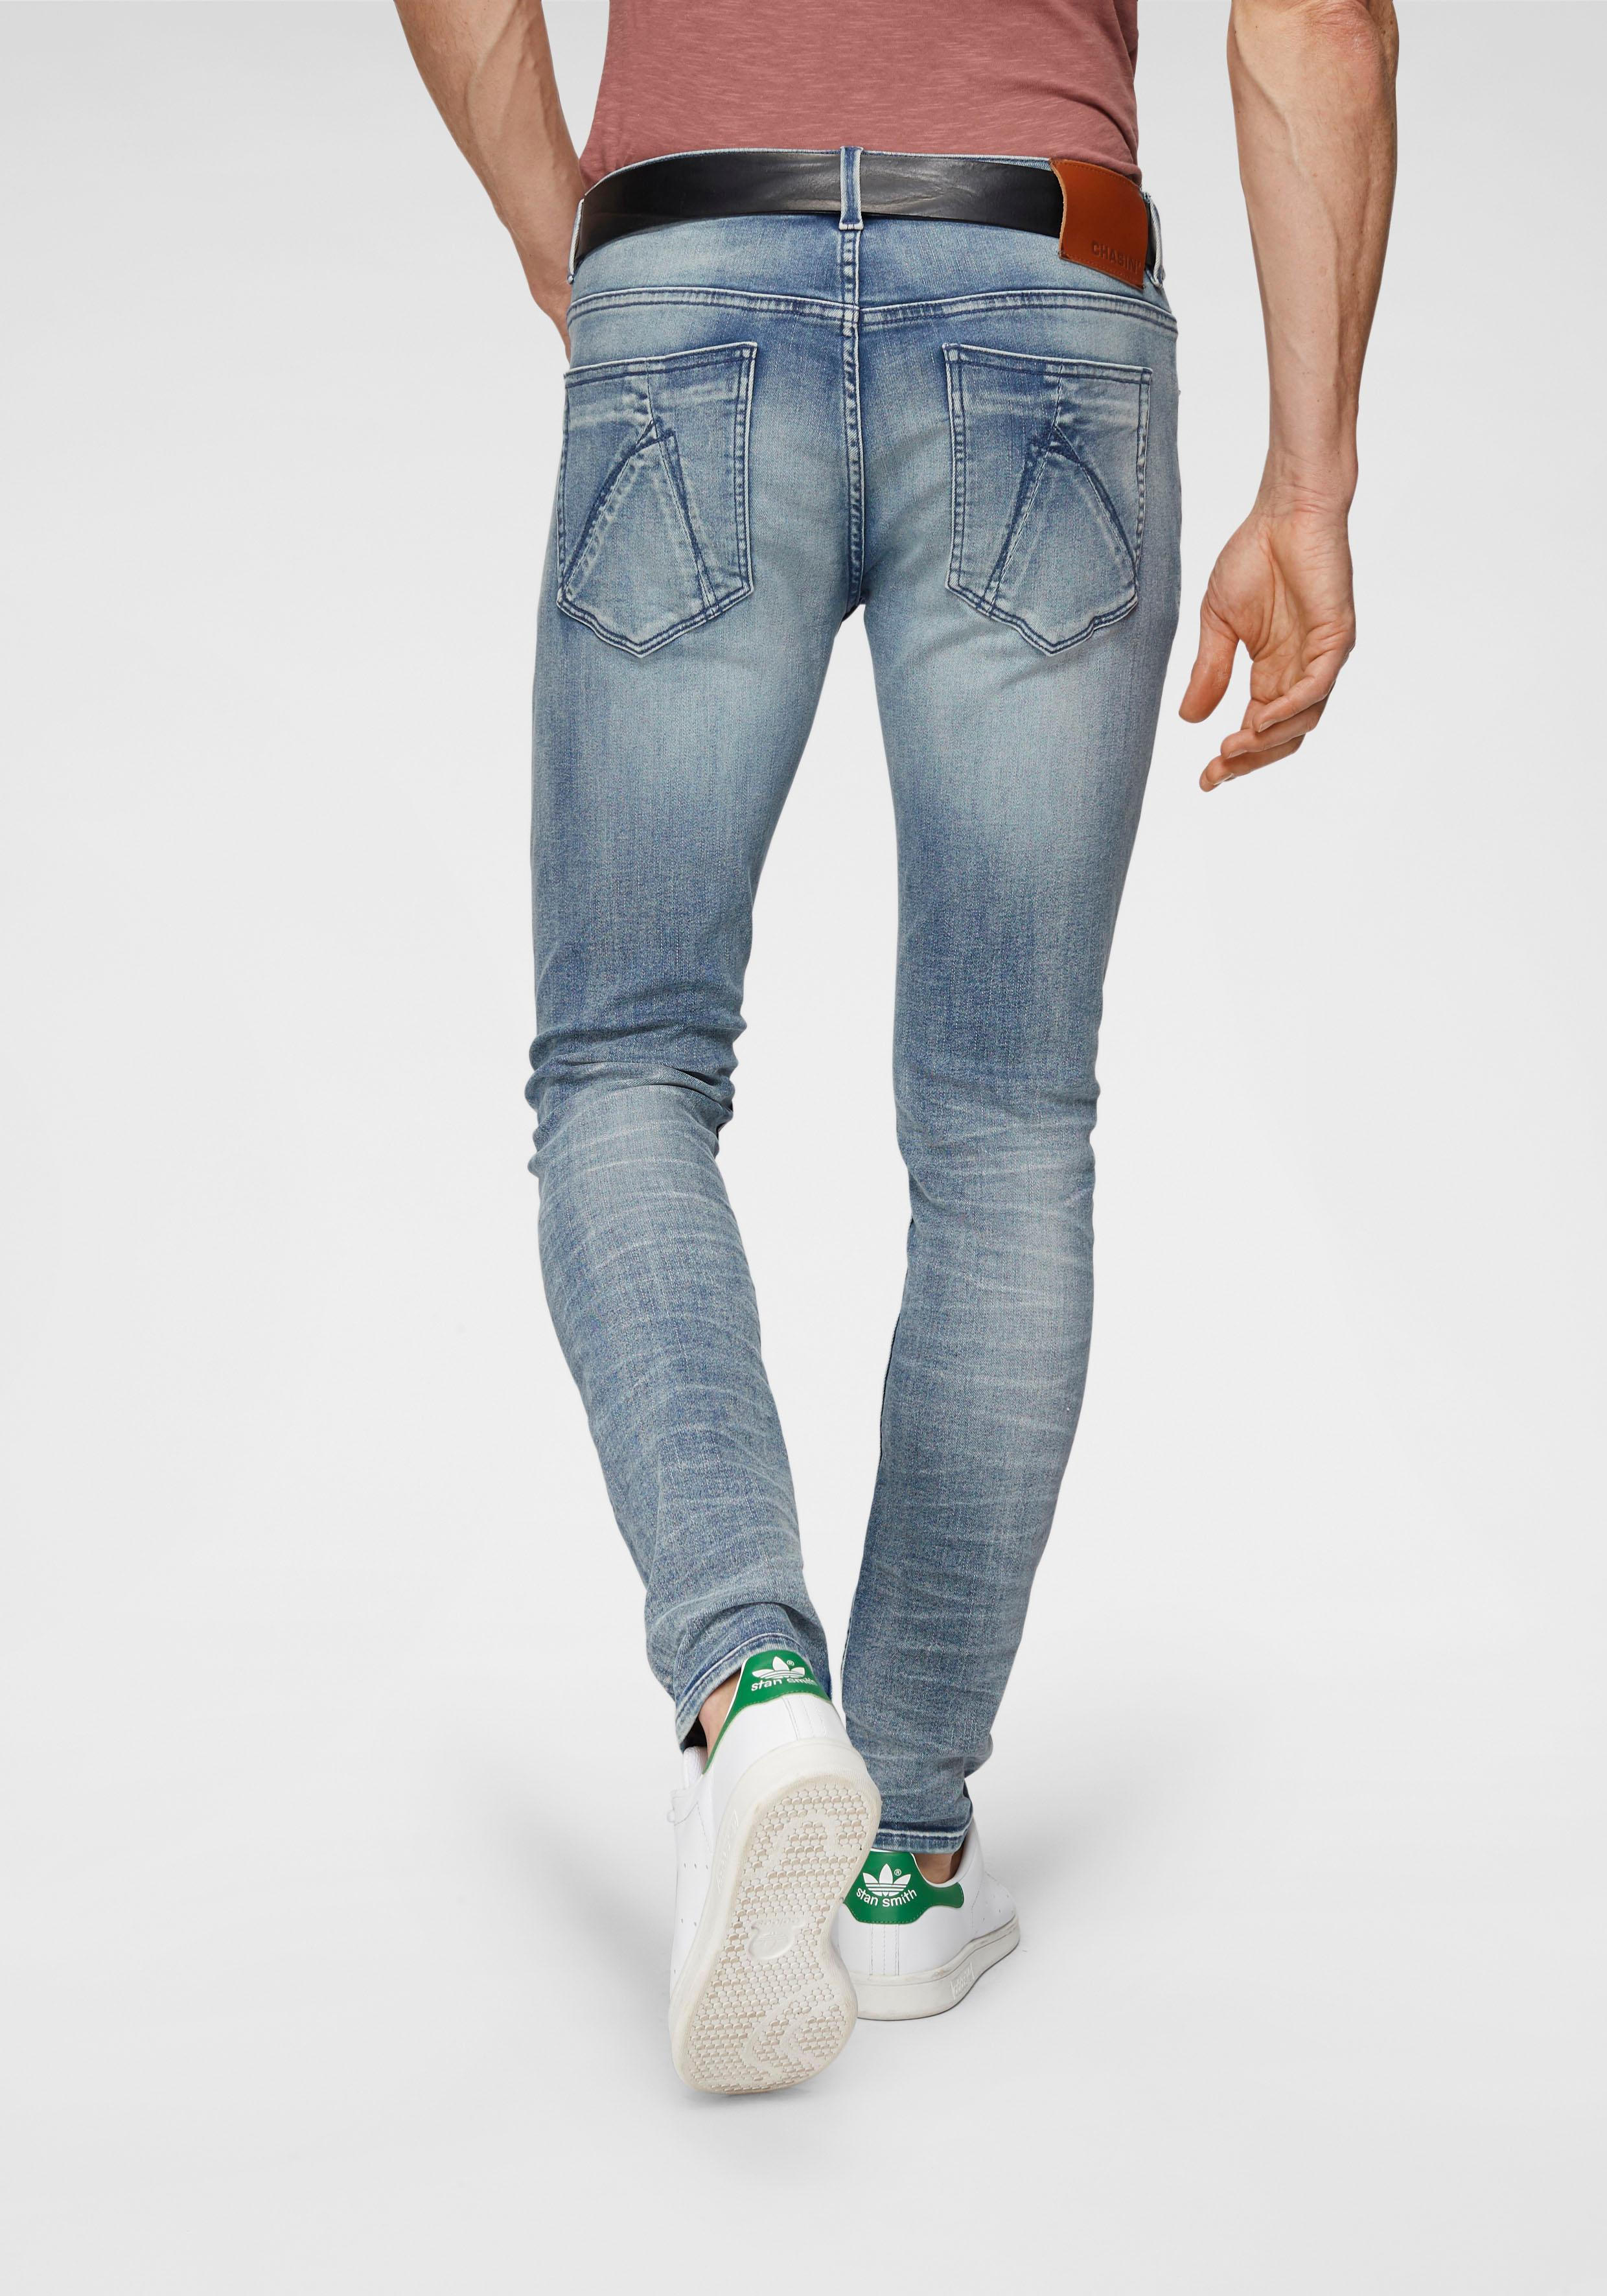 CHASIN´ Slim-fit-Jeans »EGO« | Bekleidung > Jeans > Sonstige Jeans | Blau | Jeans | CHASIN´